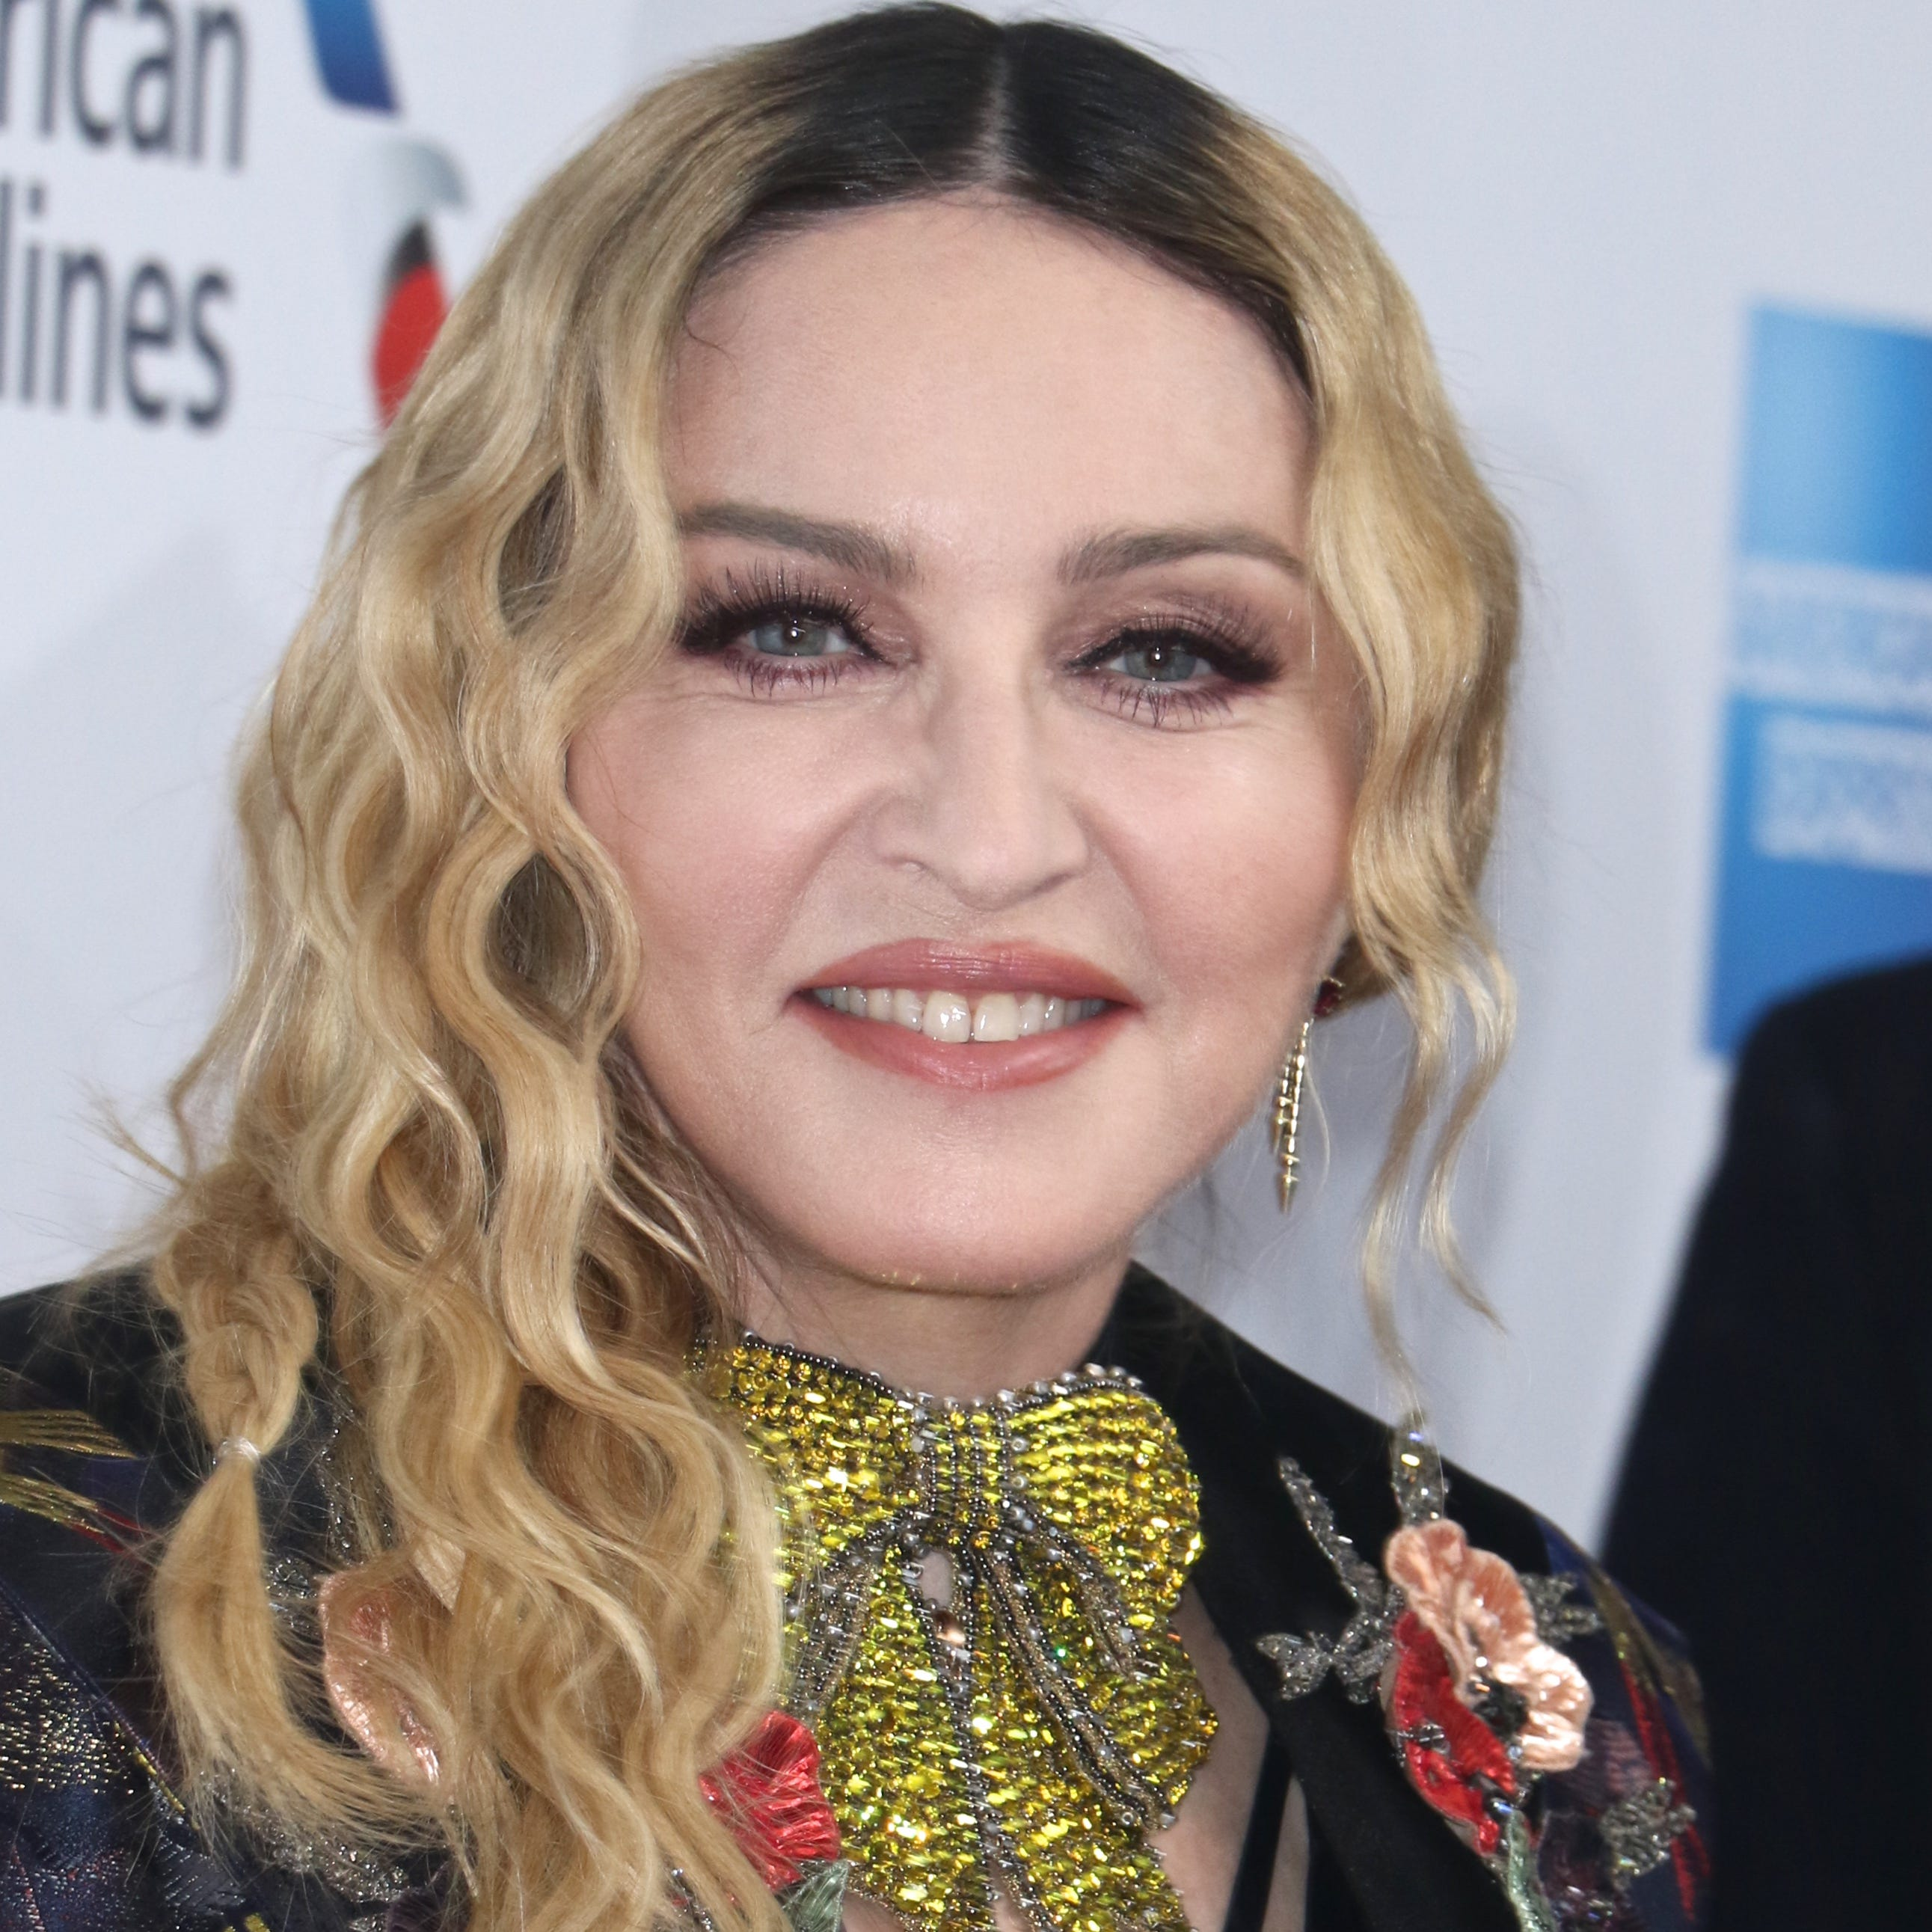 Entertainment – Celebrity News, Movie Releases, TV Updates